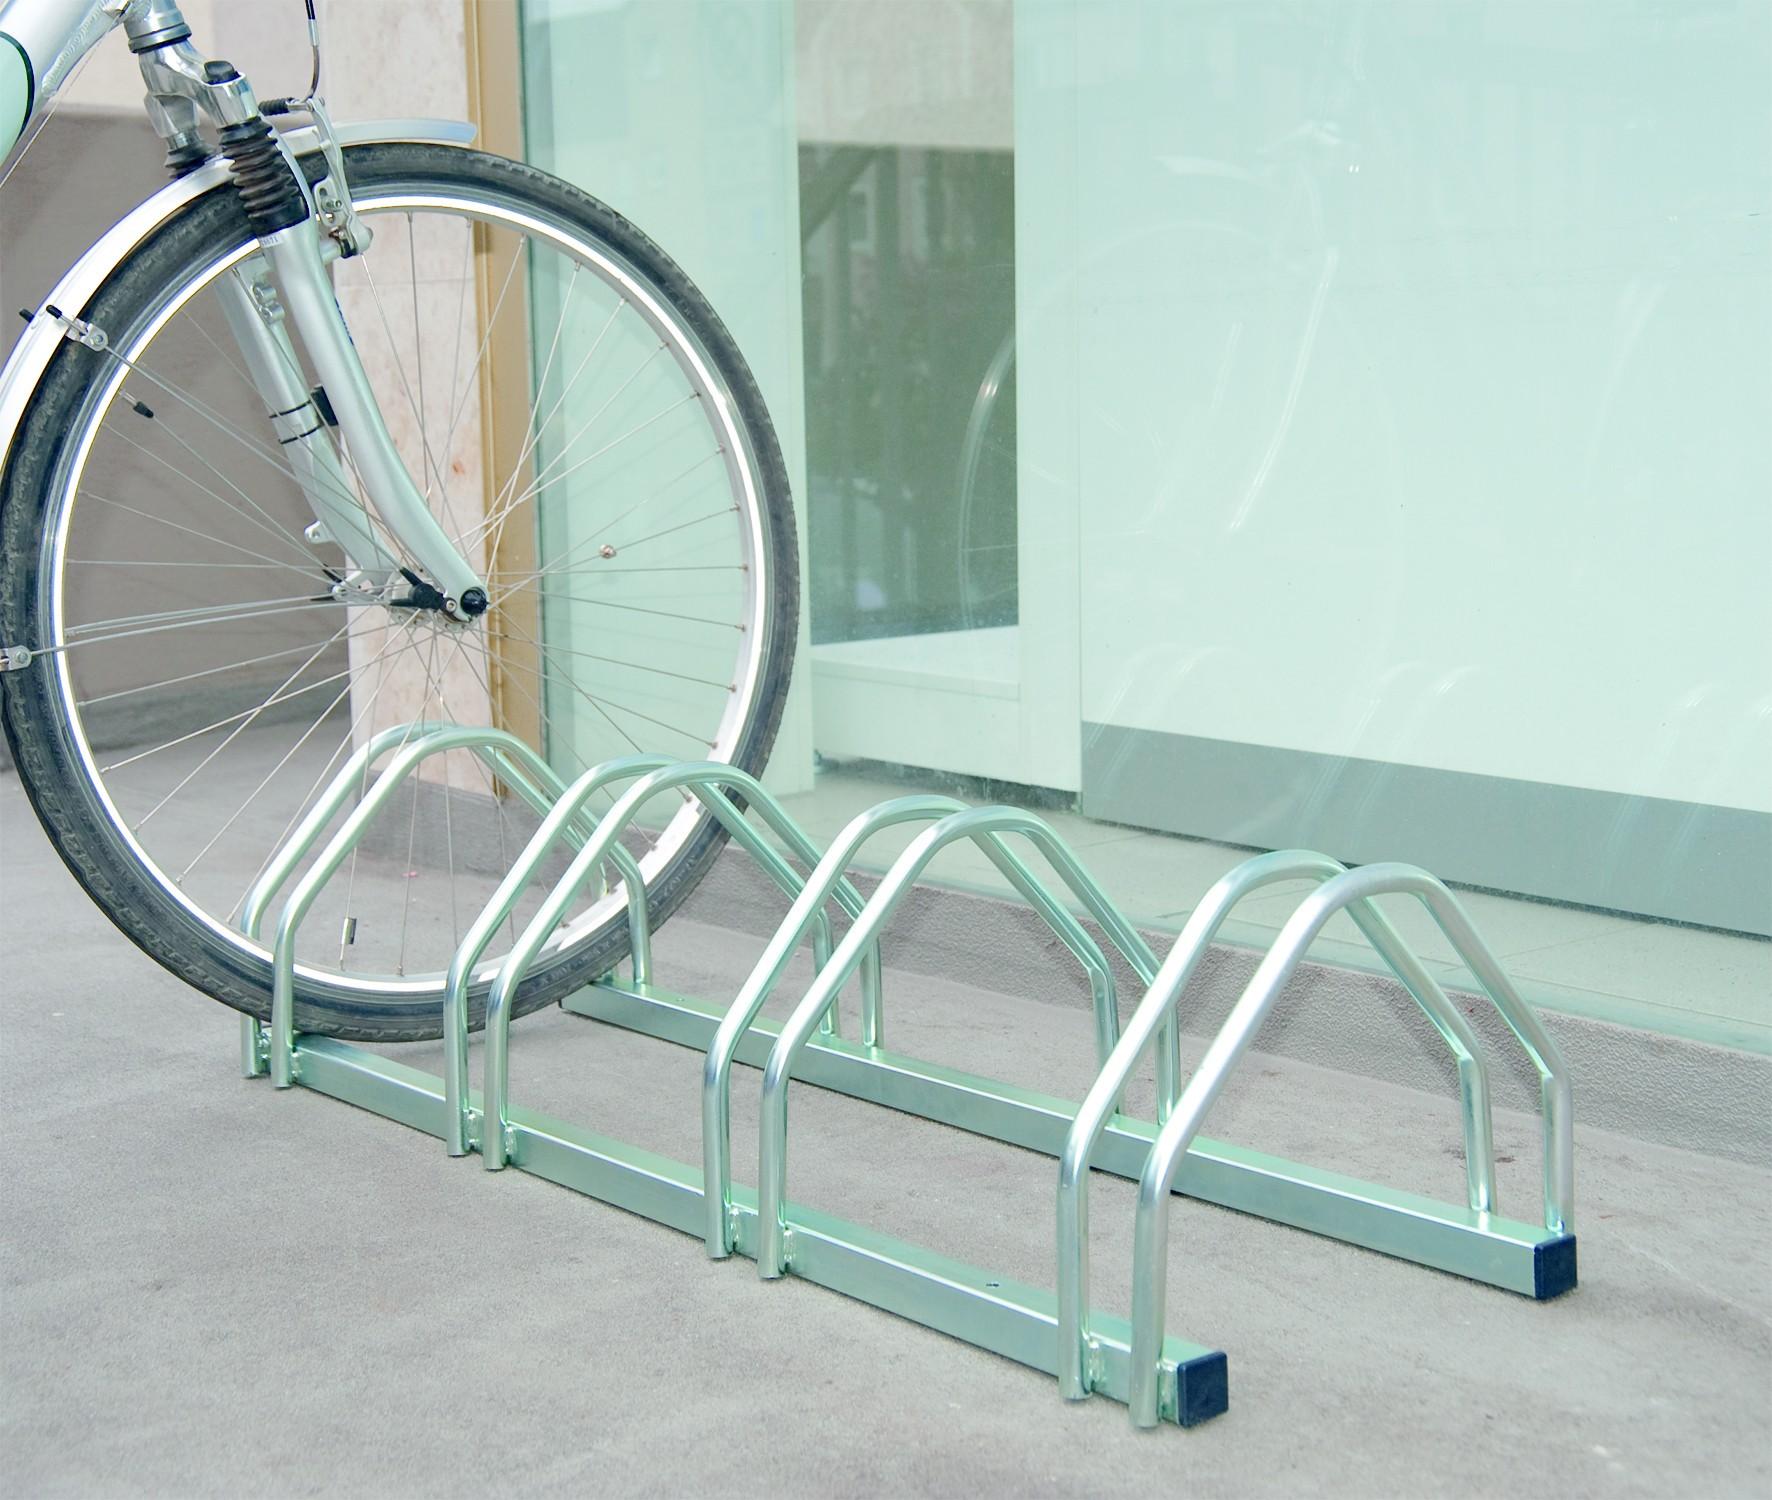 Compact Bicycle Rack